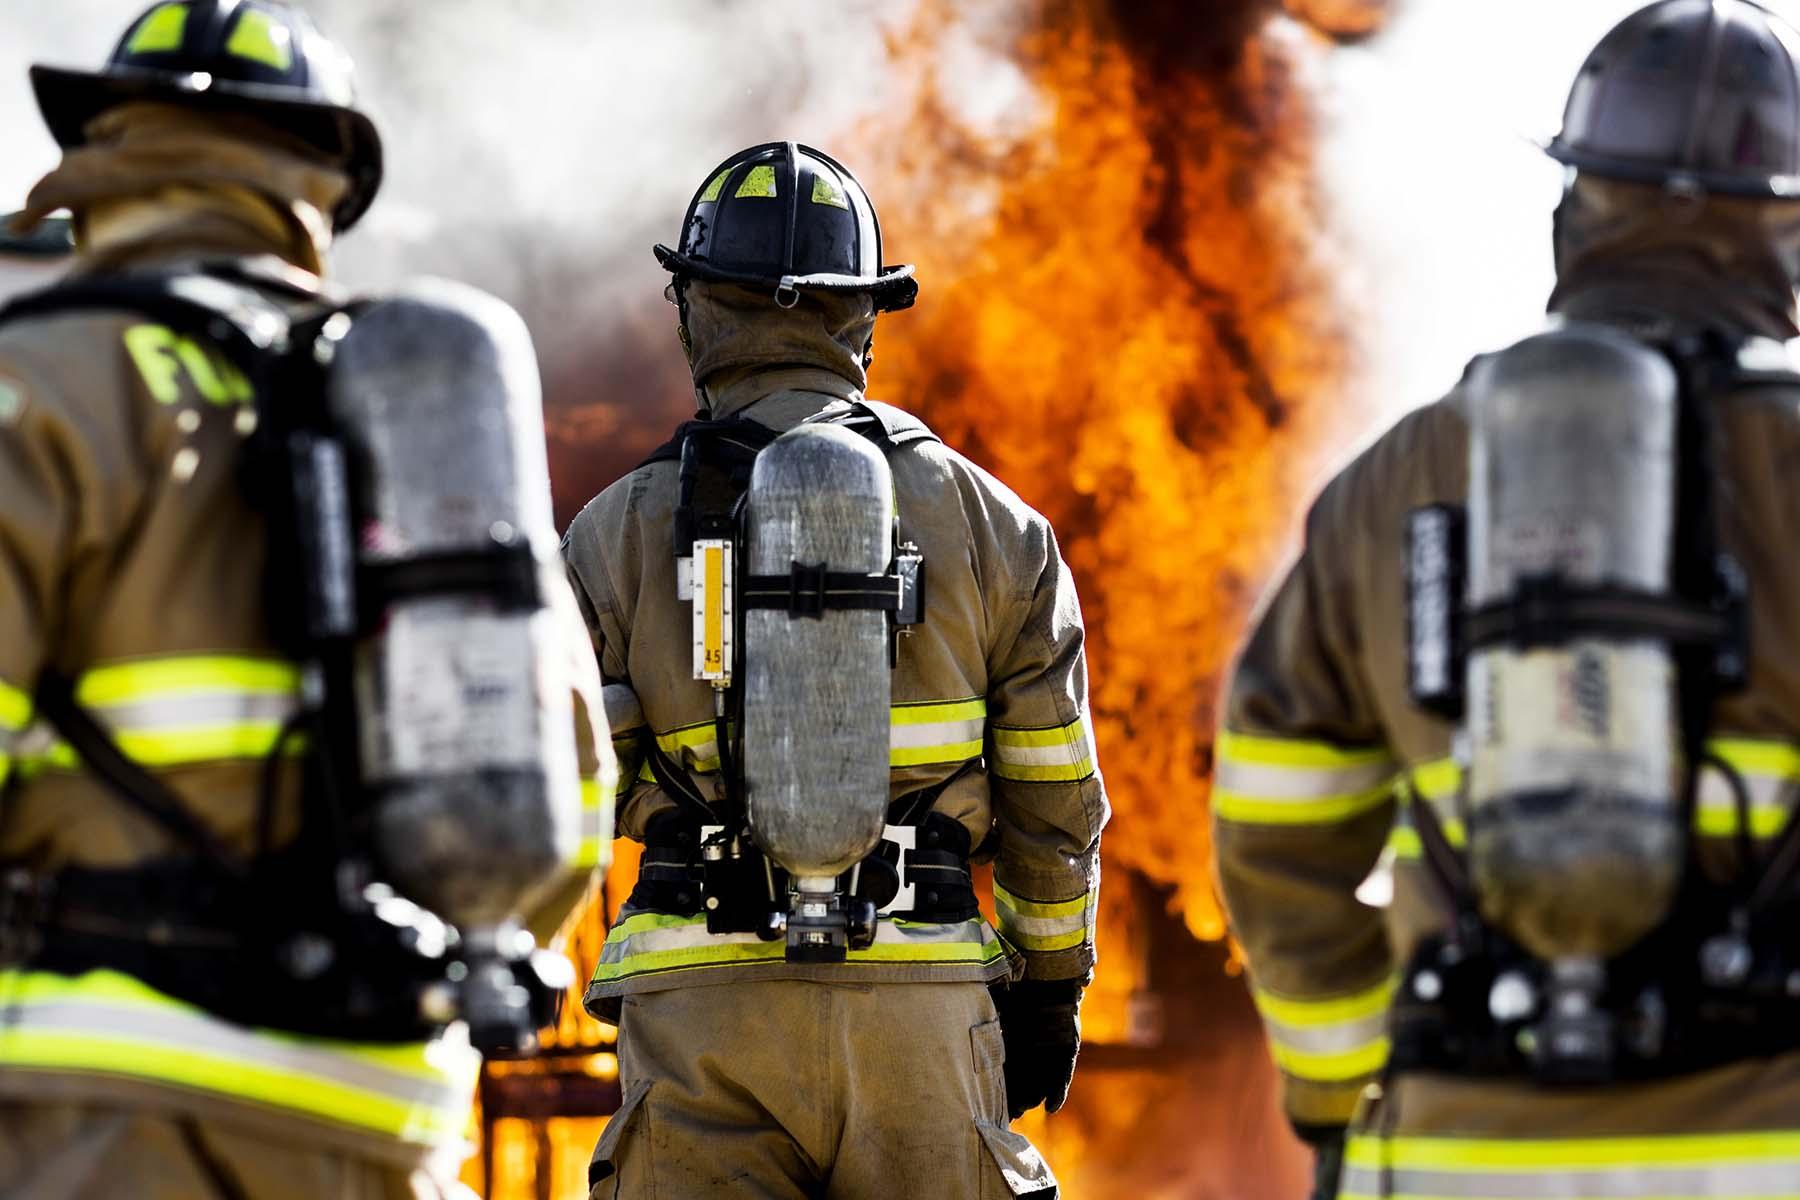 firefighters wearing PPE